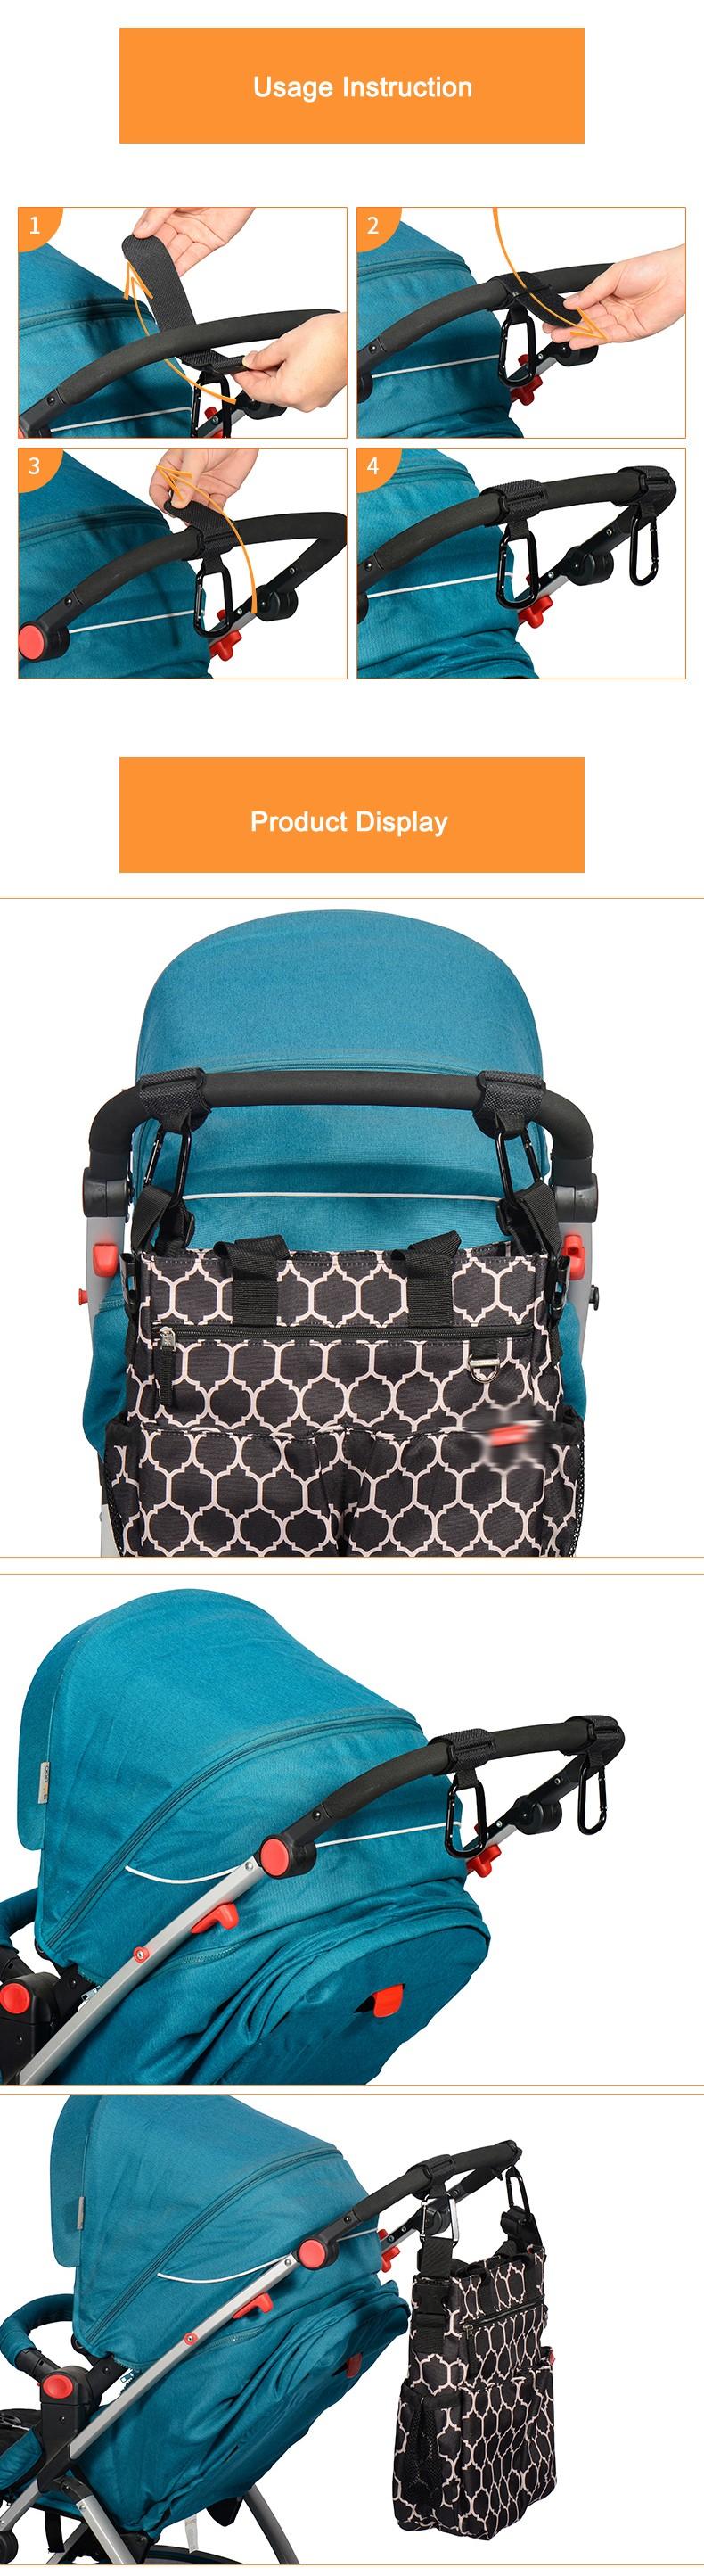 New-Stroller-Hanger-Hooks-Clips-Carabiner-Hook-for-Diaper-Bag-Hangs-on-Pushchair-Stroller-Pram-Buggy-Baby-Accessories-2-pcs-set-06